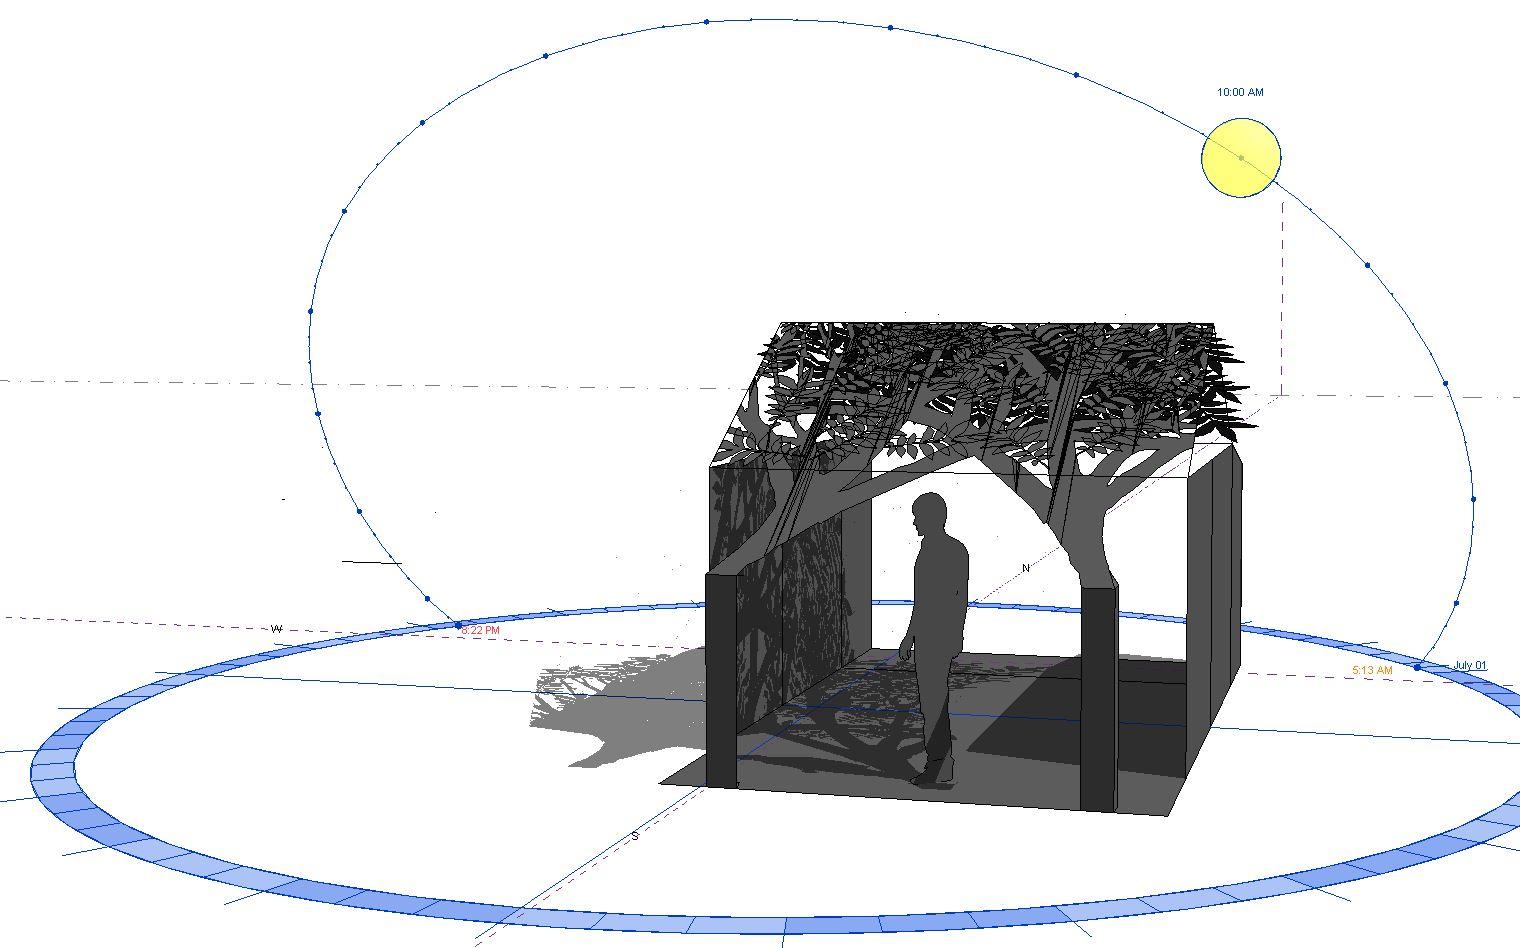 Sun angle study of the Artist's conceptual model